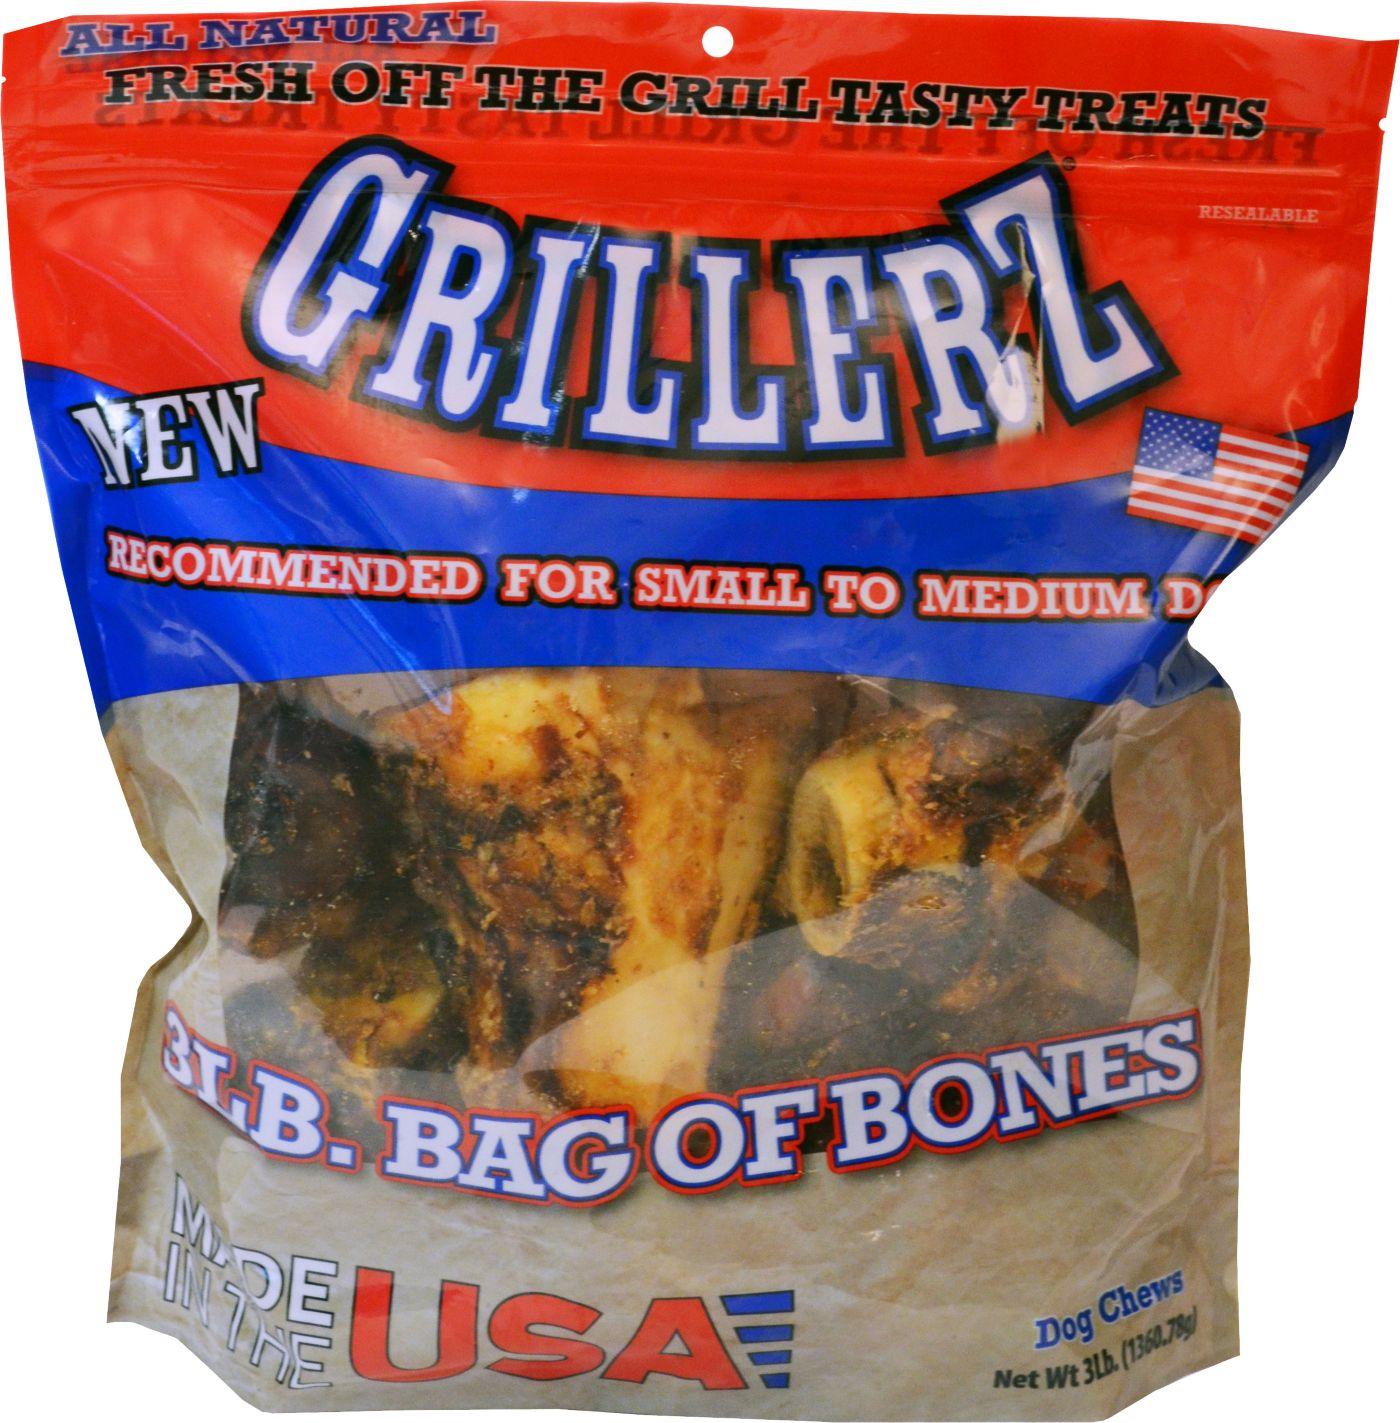 Grillerz 3 lb. Bag of Bones